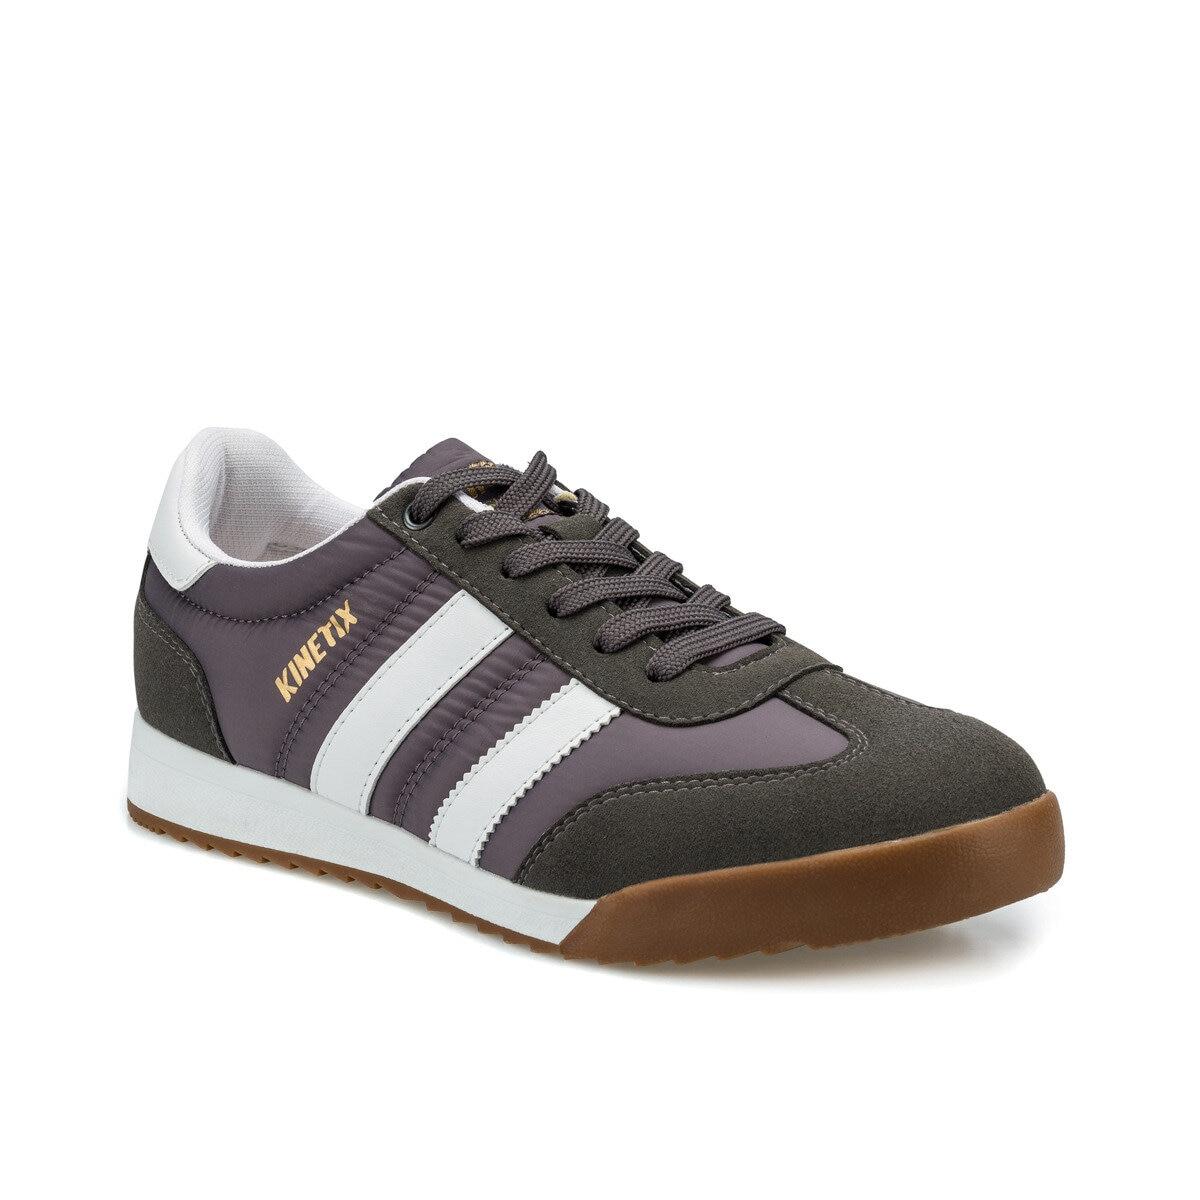 FLO GRAGAS Gray Men 'S Sneaker Shoes KINETIX